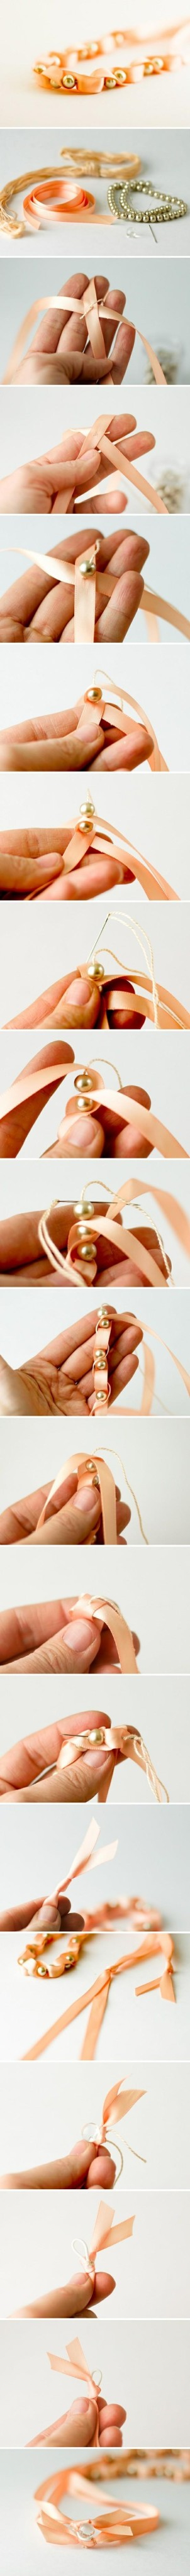 DIY Bracelet And Necklace